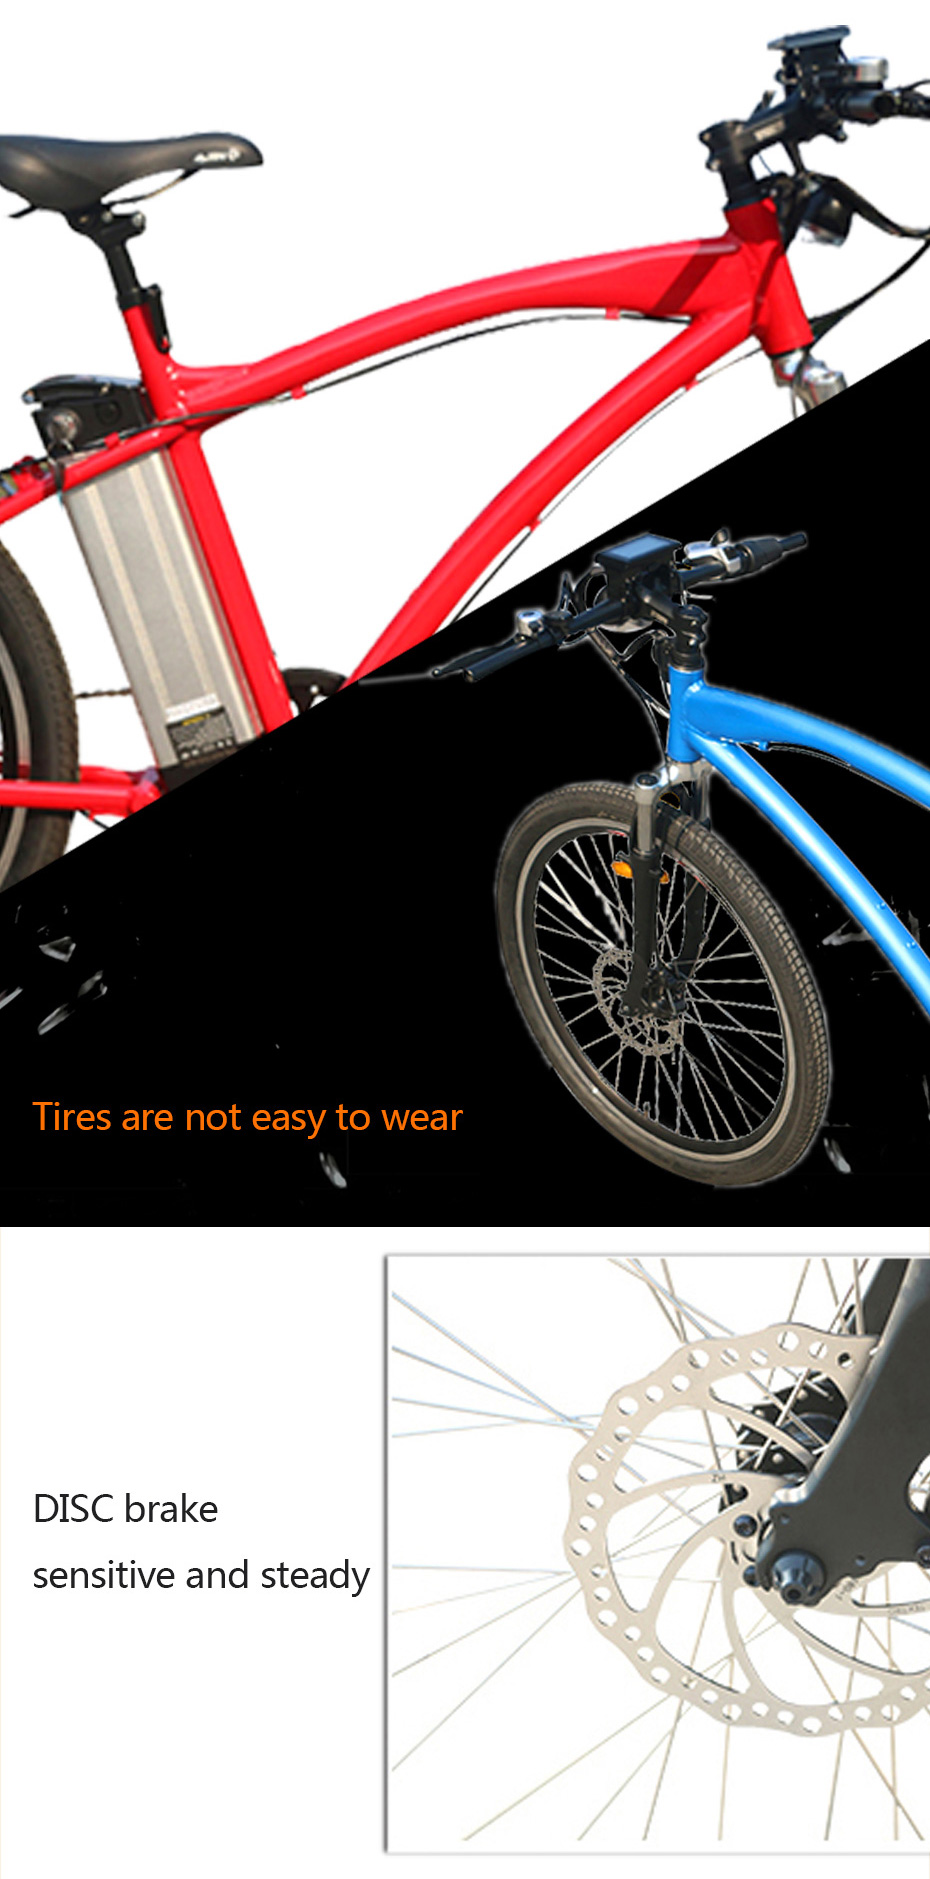 HTB1NTSWpqAoBKNjSZSyq6yHAVXaq - 48V 500W 26inch MTB Electrical Bike 48V 12Ah Lithium Battery Mountain Aluminum Alloy 45km/h Quick Velocity 26'' 2.125 Tire LCD Show